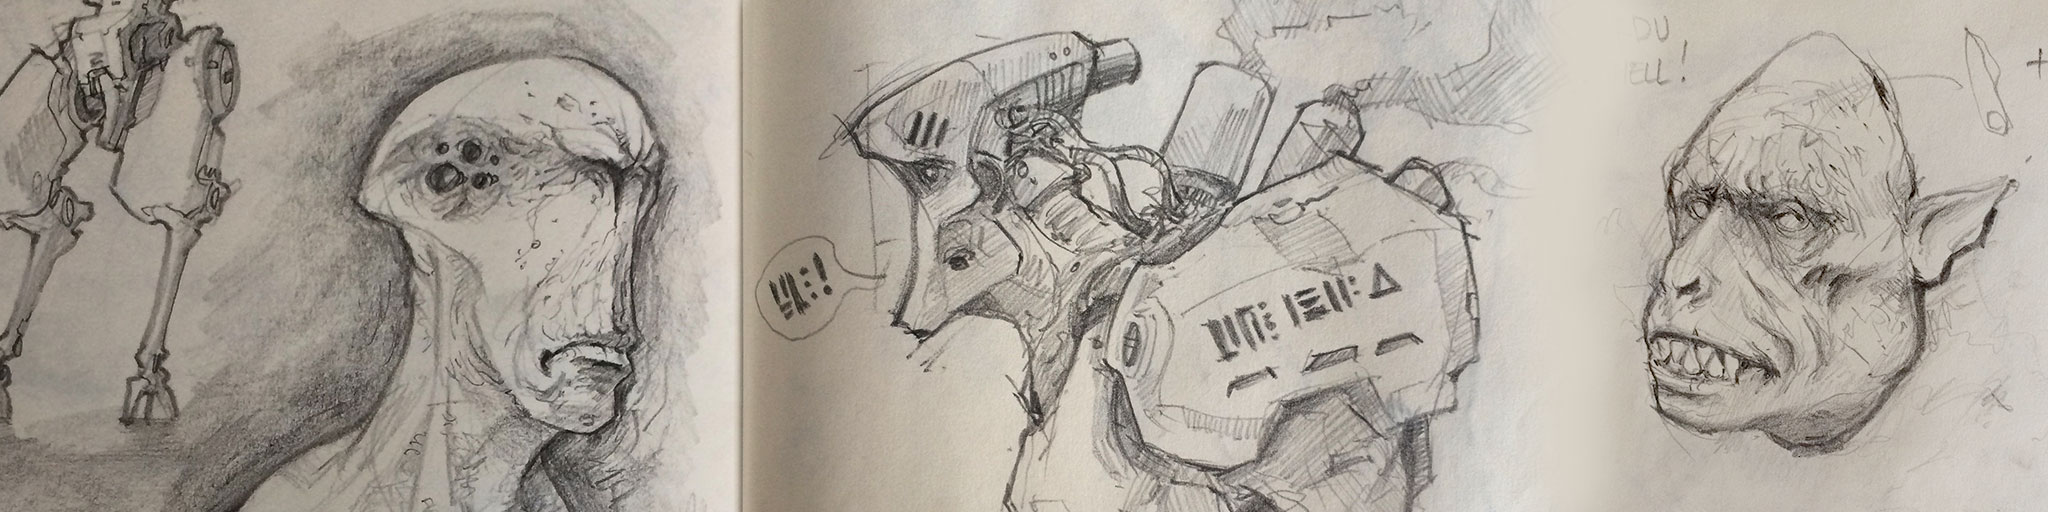 Sketchbook (Feb 2017) feature image